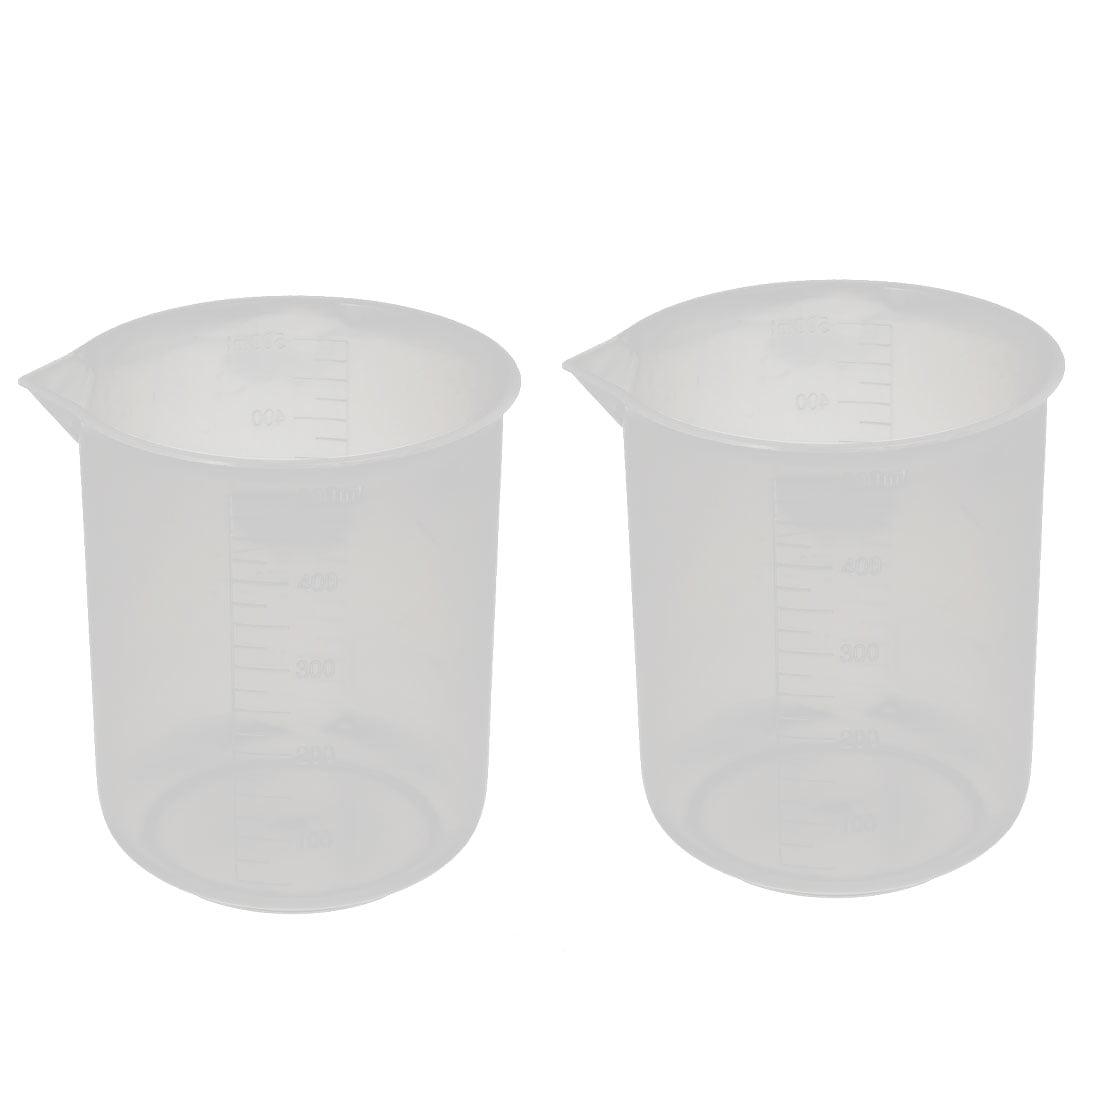 2 Pcs 500mL Laboratory Transparent Plastic Liquid Container Measuring Cup Beaker by